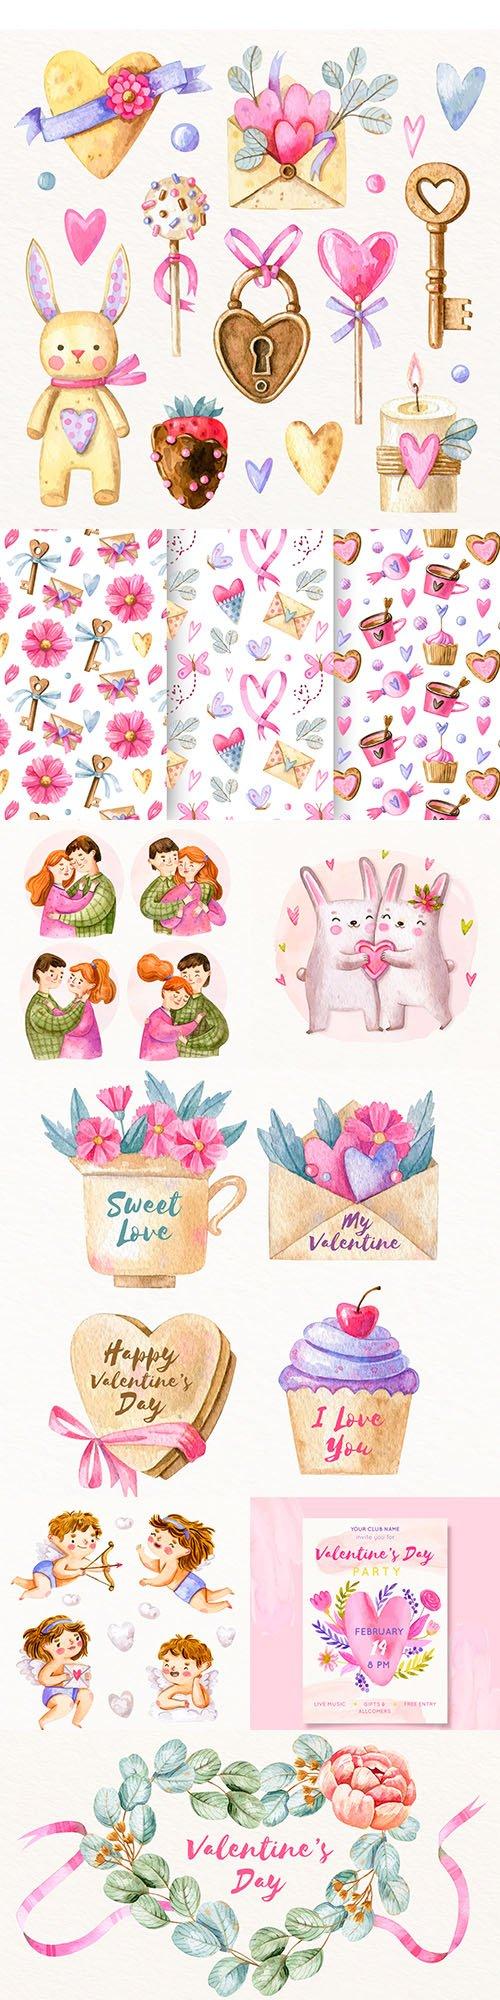 Happy Valentine's Day romantic watercolor illustrations 48